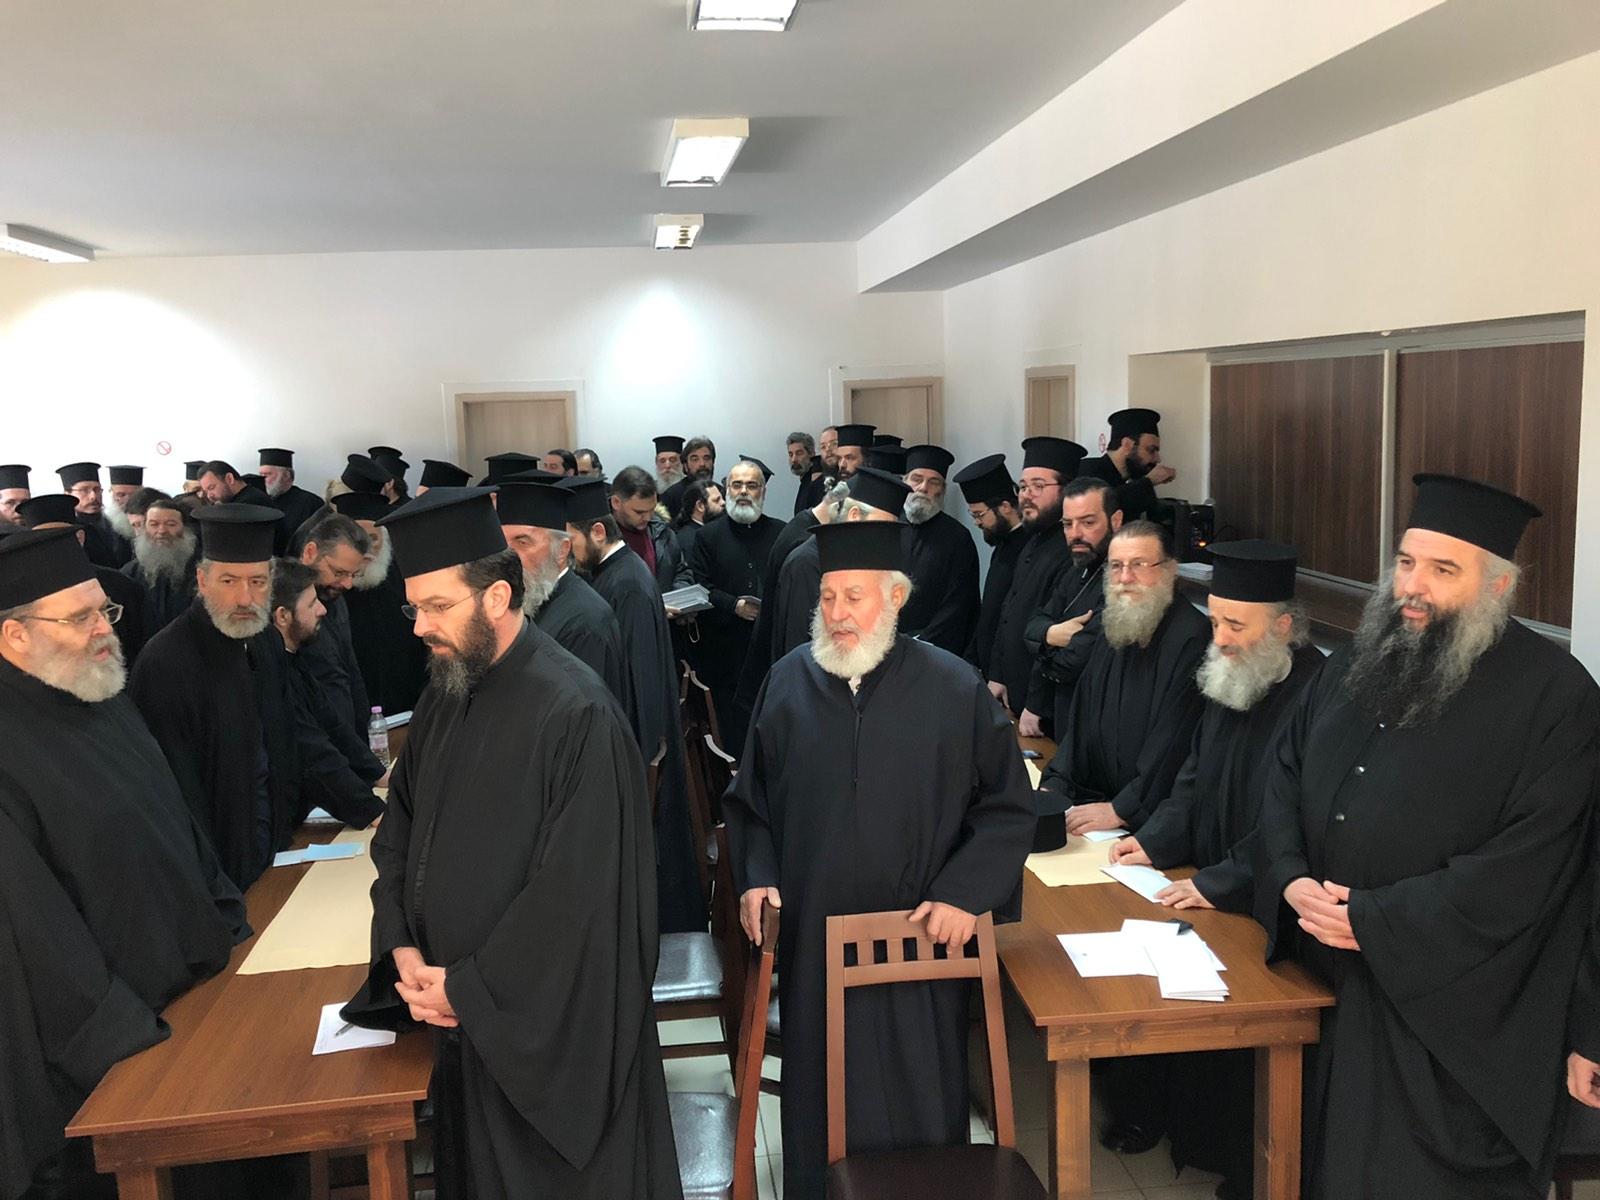 synaksi febrouariou 2 - Ιερατική Σύναξη στο Μελισσοχώρι (φωτο)